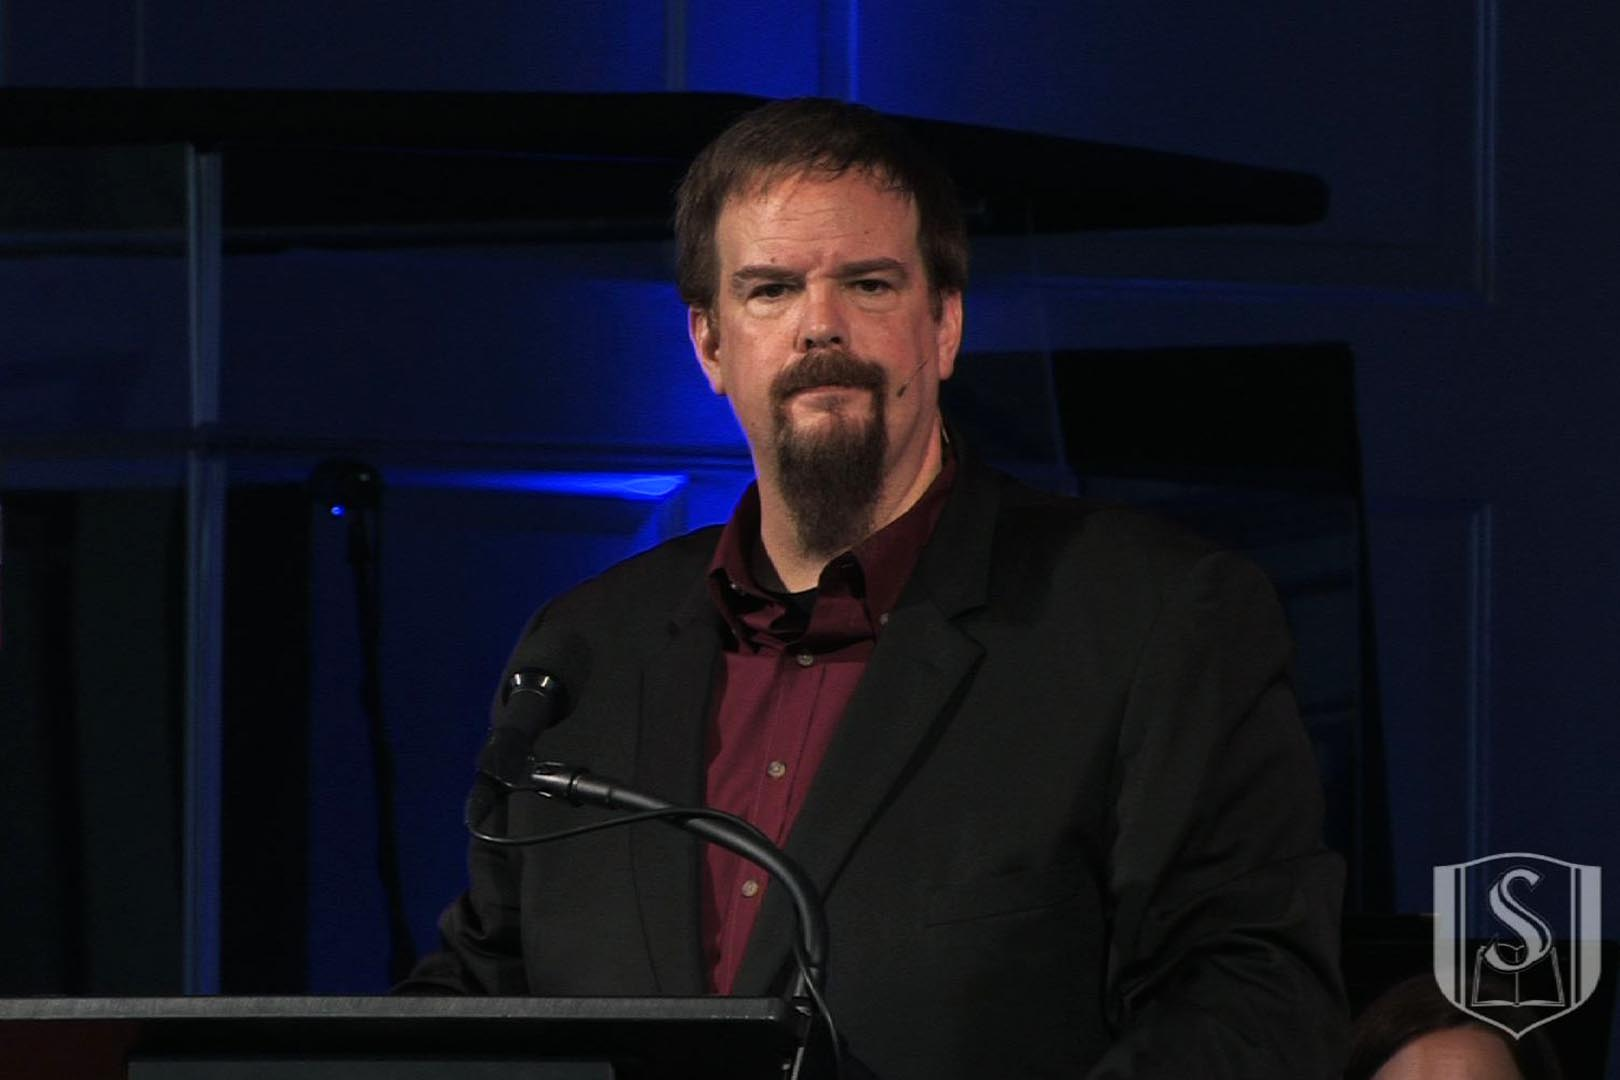 Ed Stetzer – Subversive Kingdom – Matthew 4:12-17